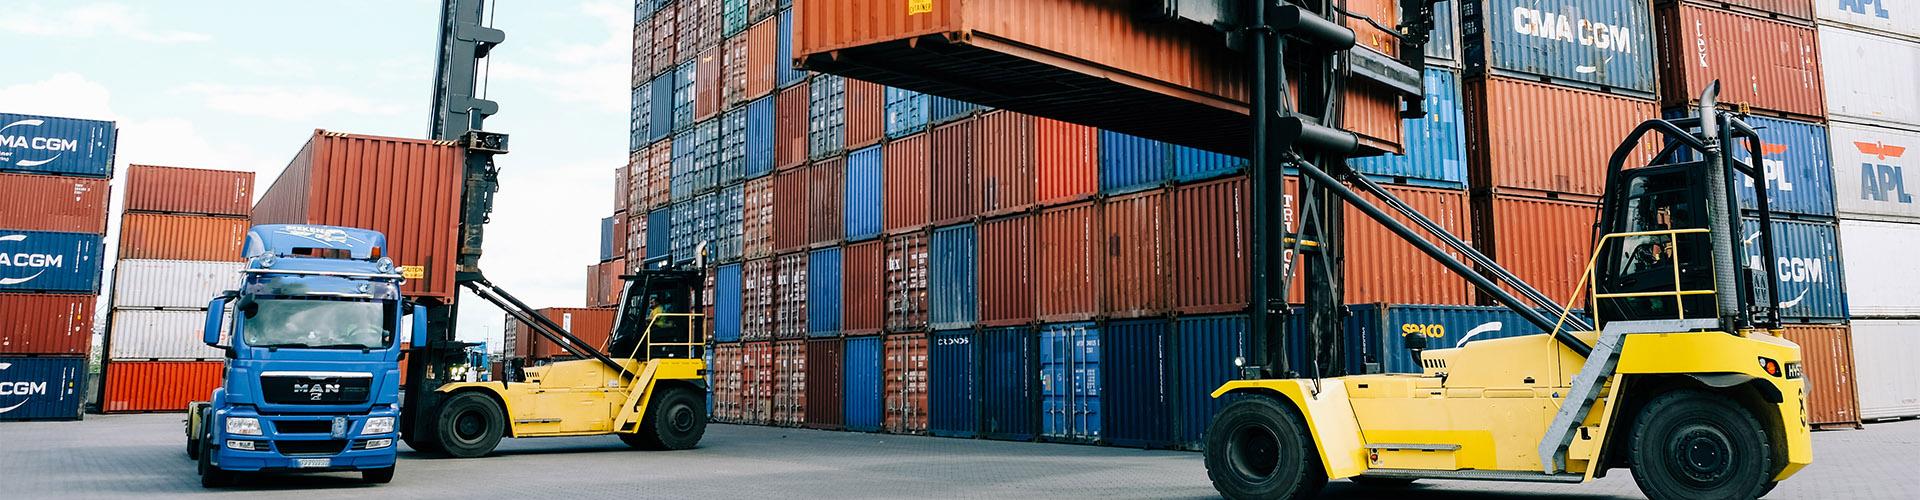 My CCIS Containerchain